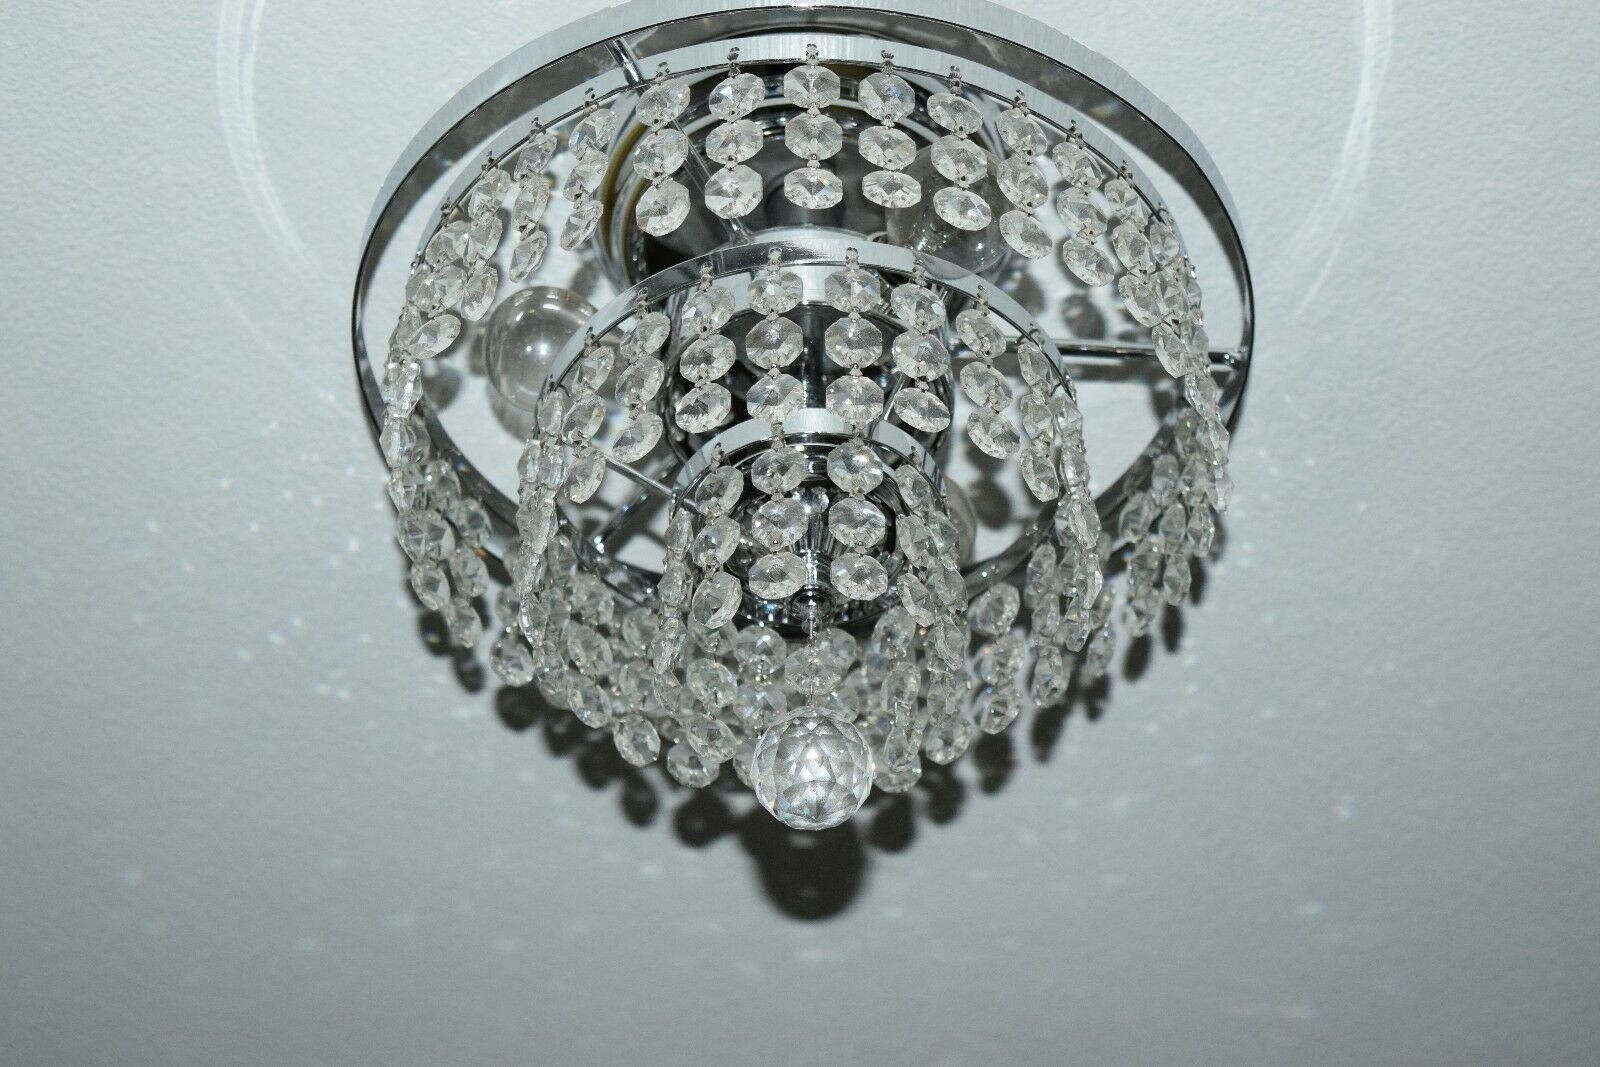 Glow Lighting Vista 3 light Semi Flush Crystal Ceiling light